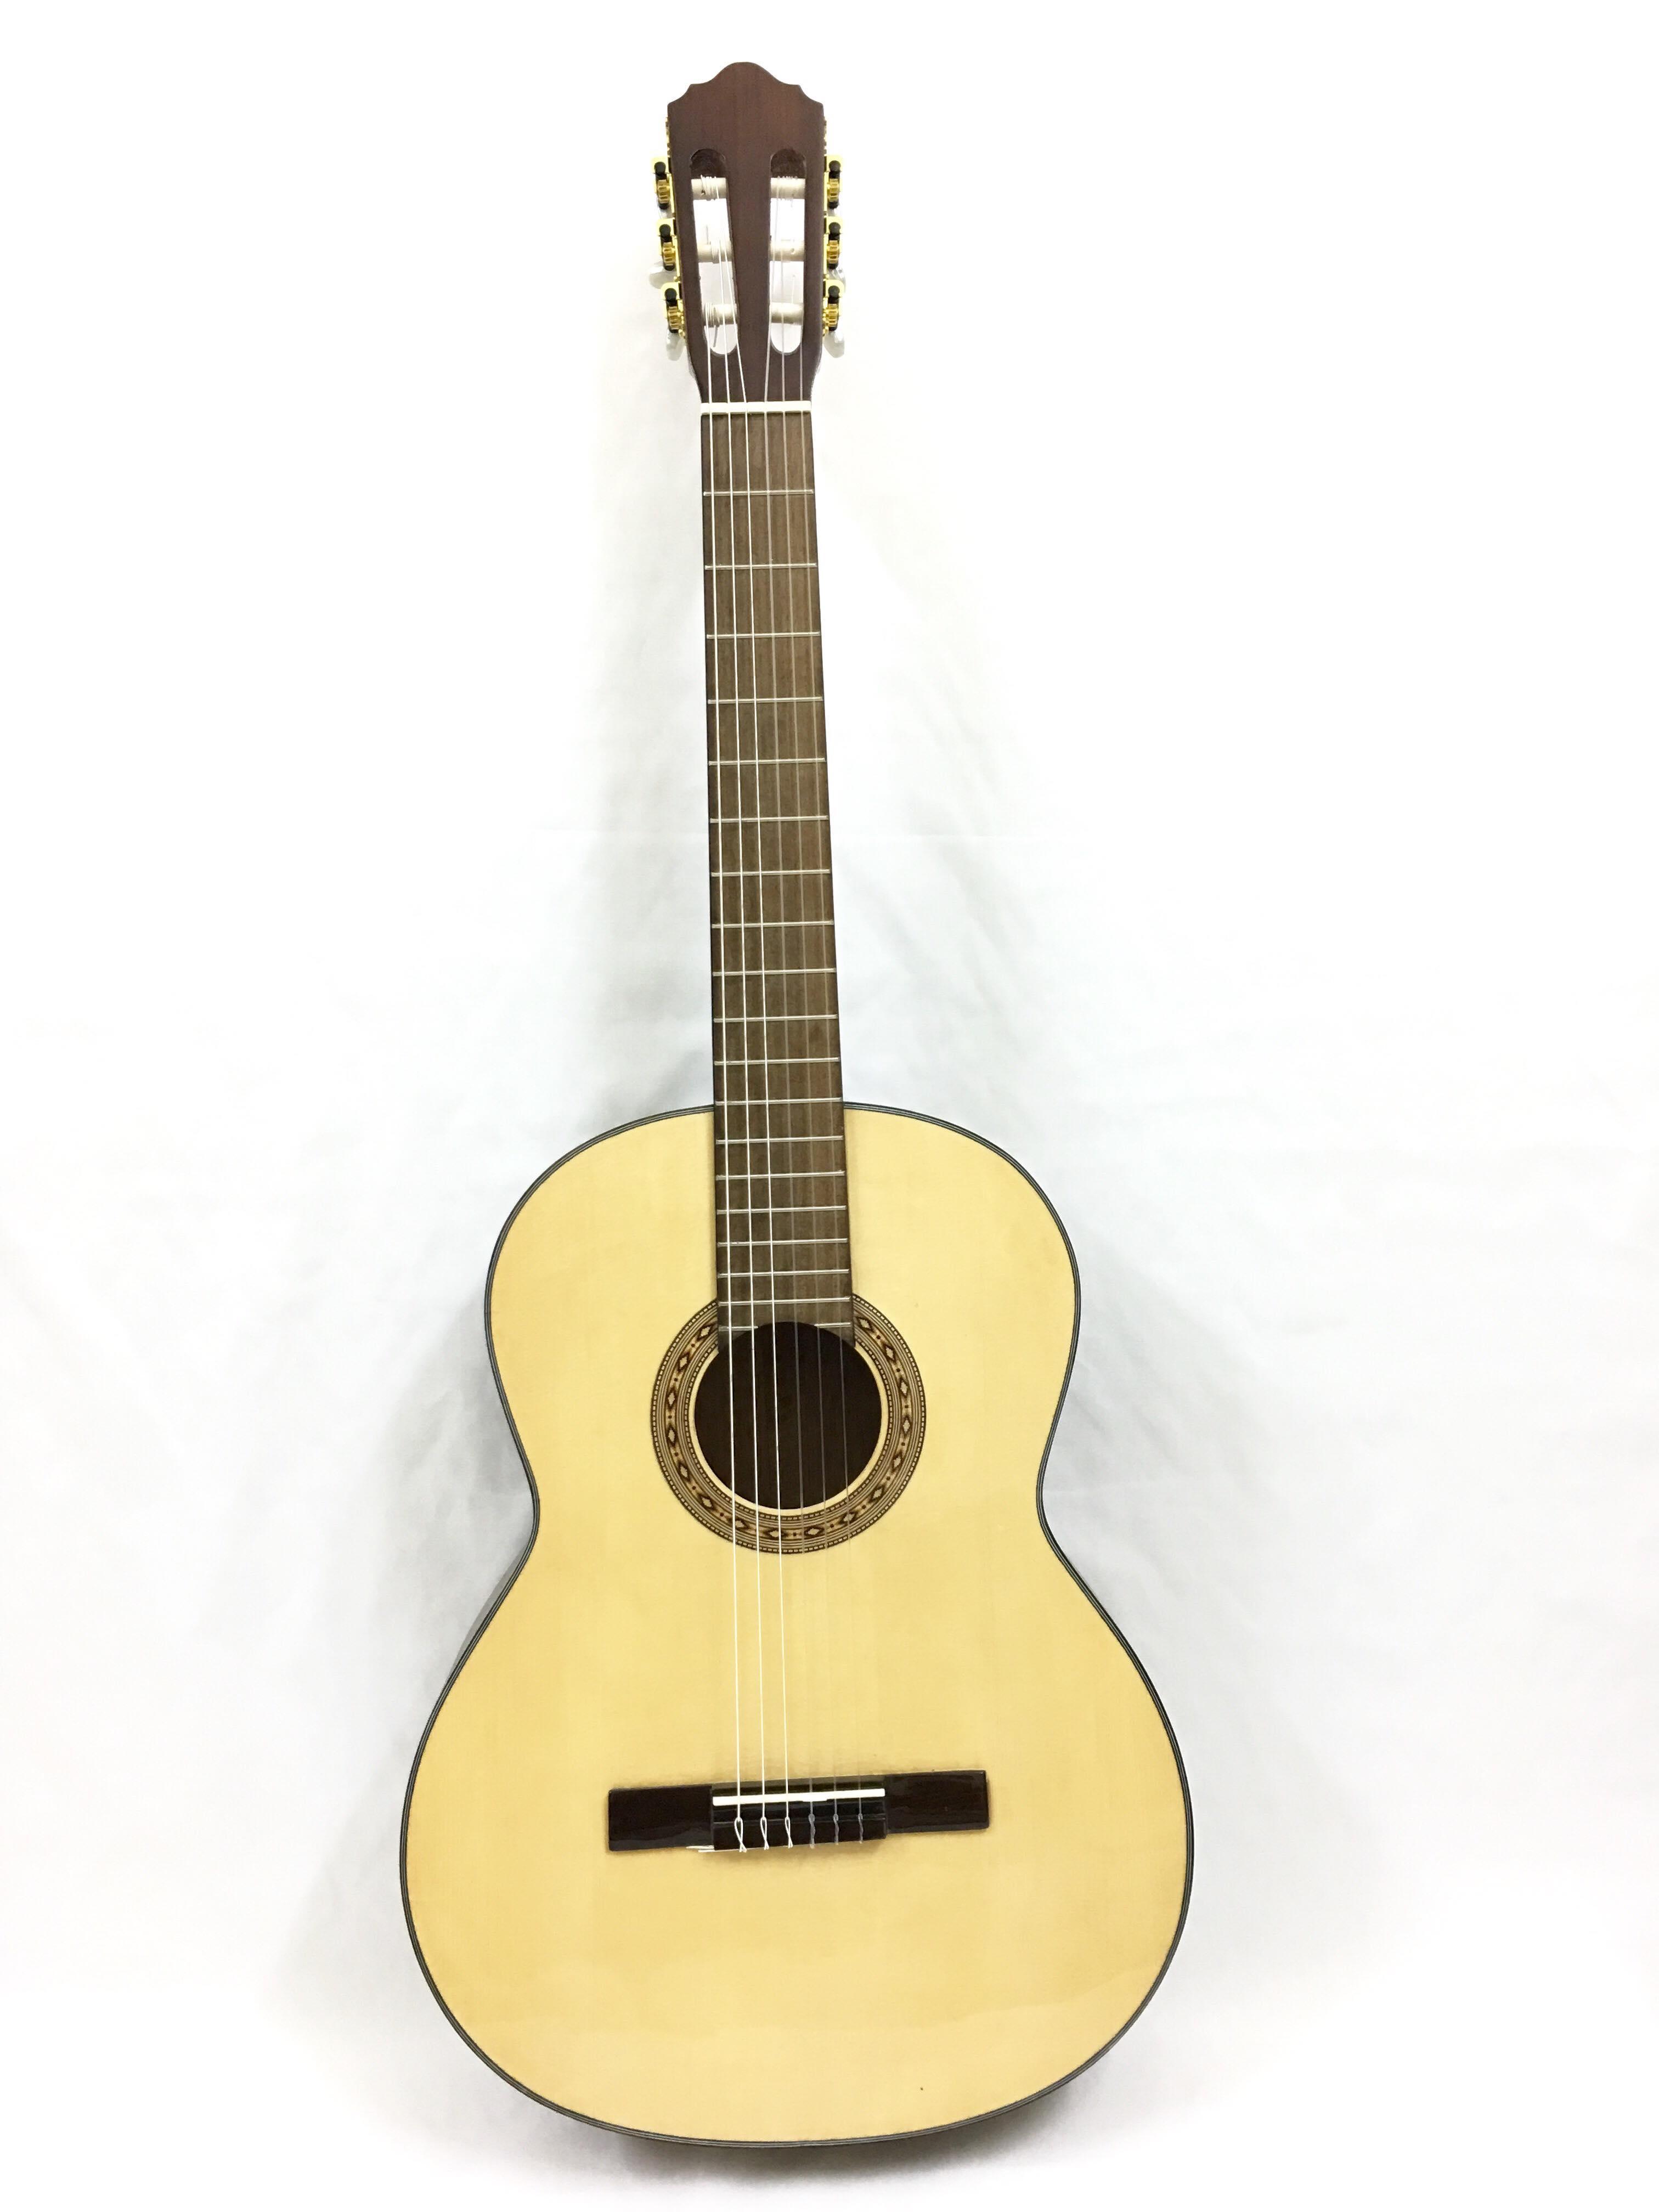 dan guitar classic c-150 giá tốt